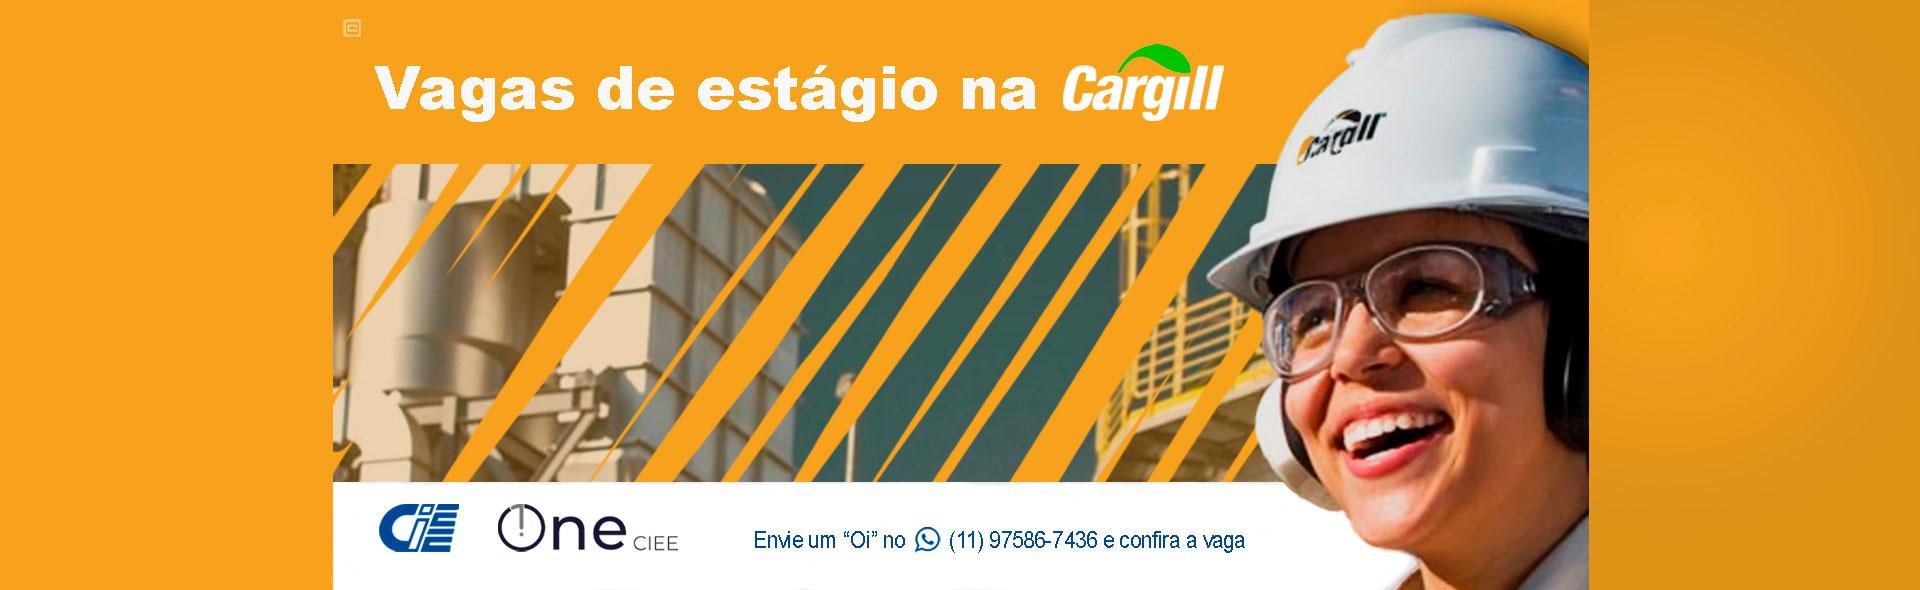 Vagas de estágio na Cargill - Envie um oi no whatsapp 11 97586-7436 e confira a vaga